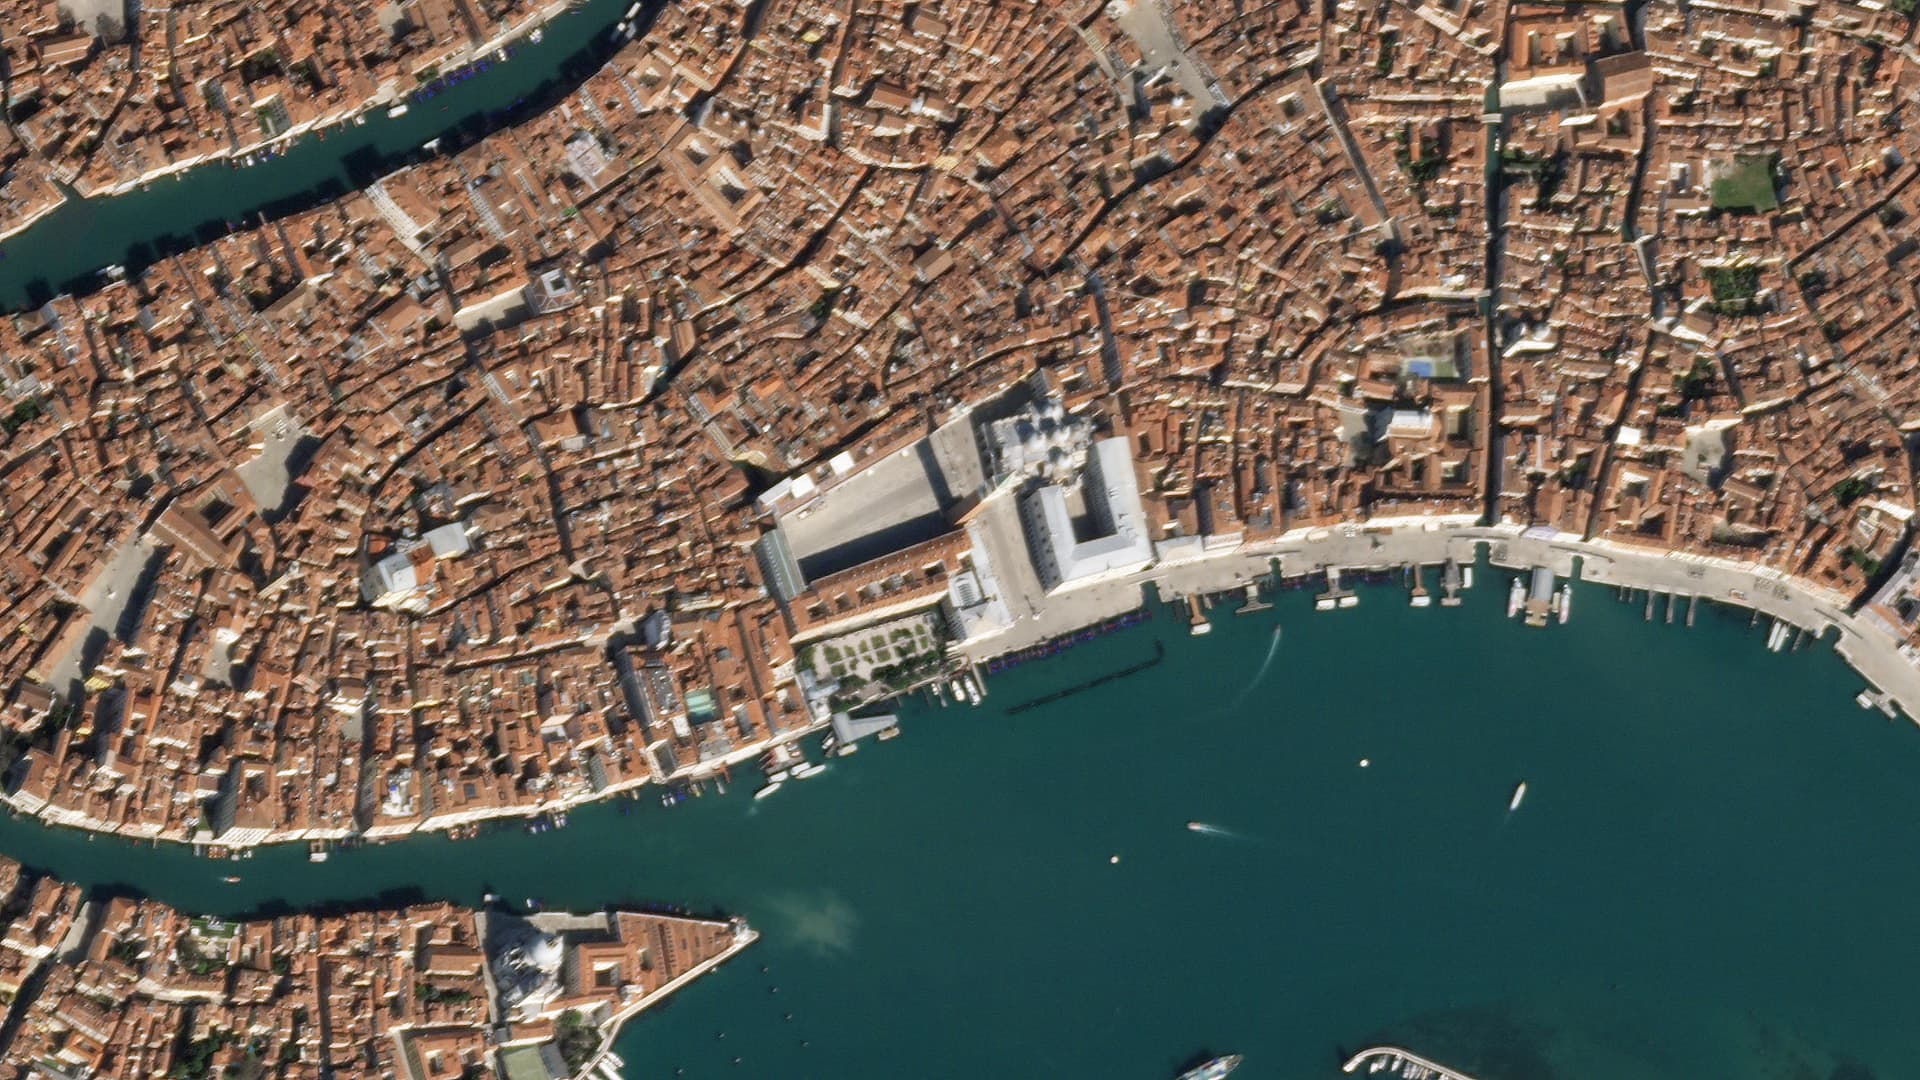 Coronavirus Impact Satellites Show World Cities After Outbreak